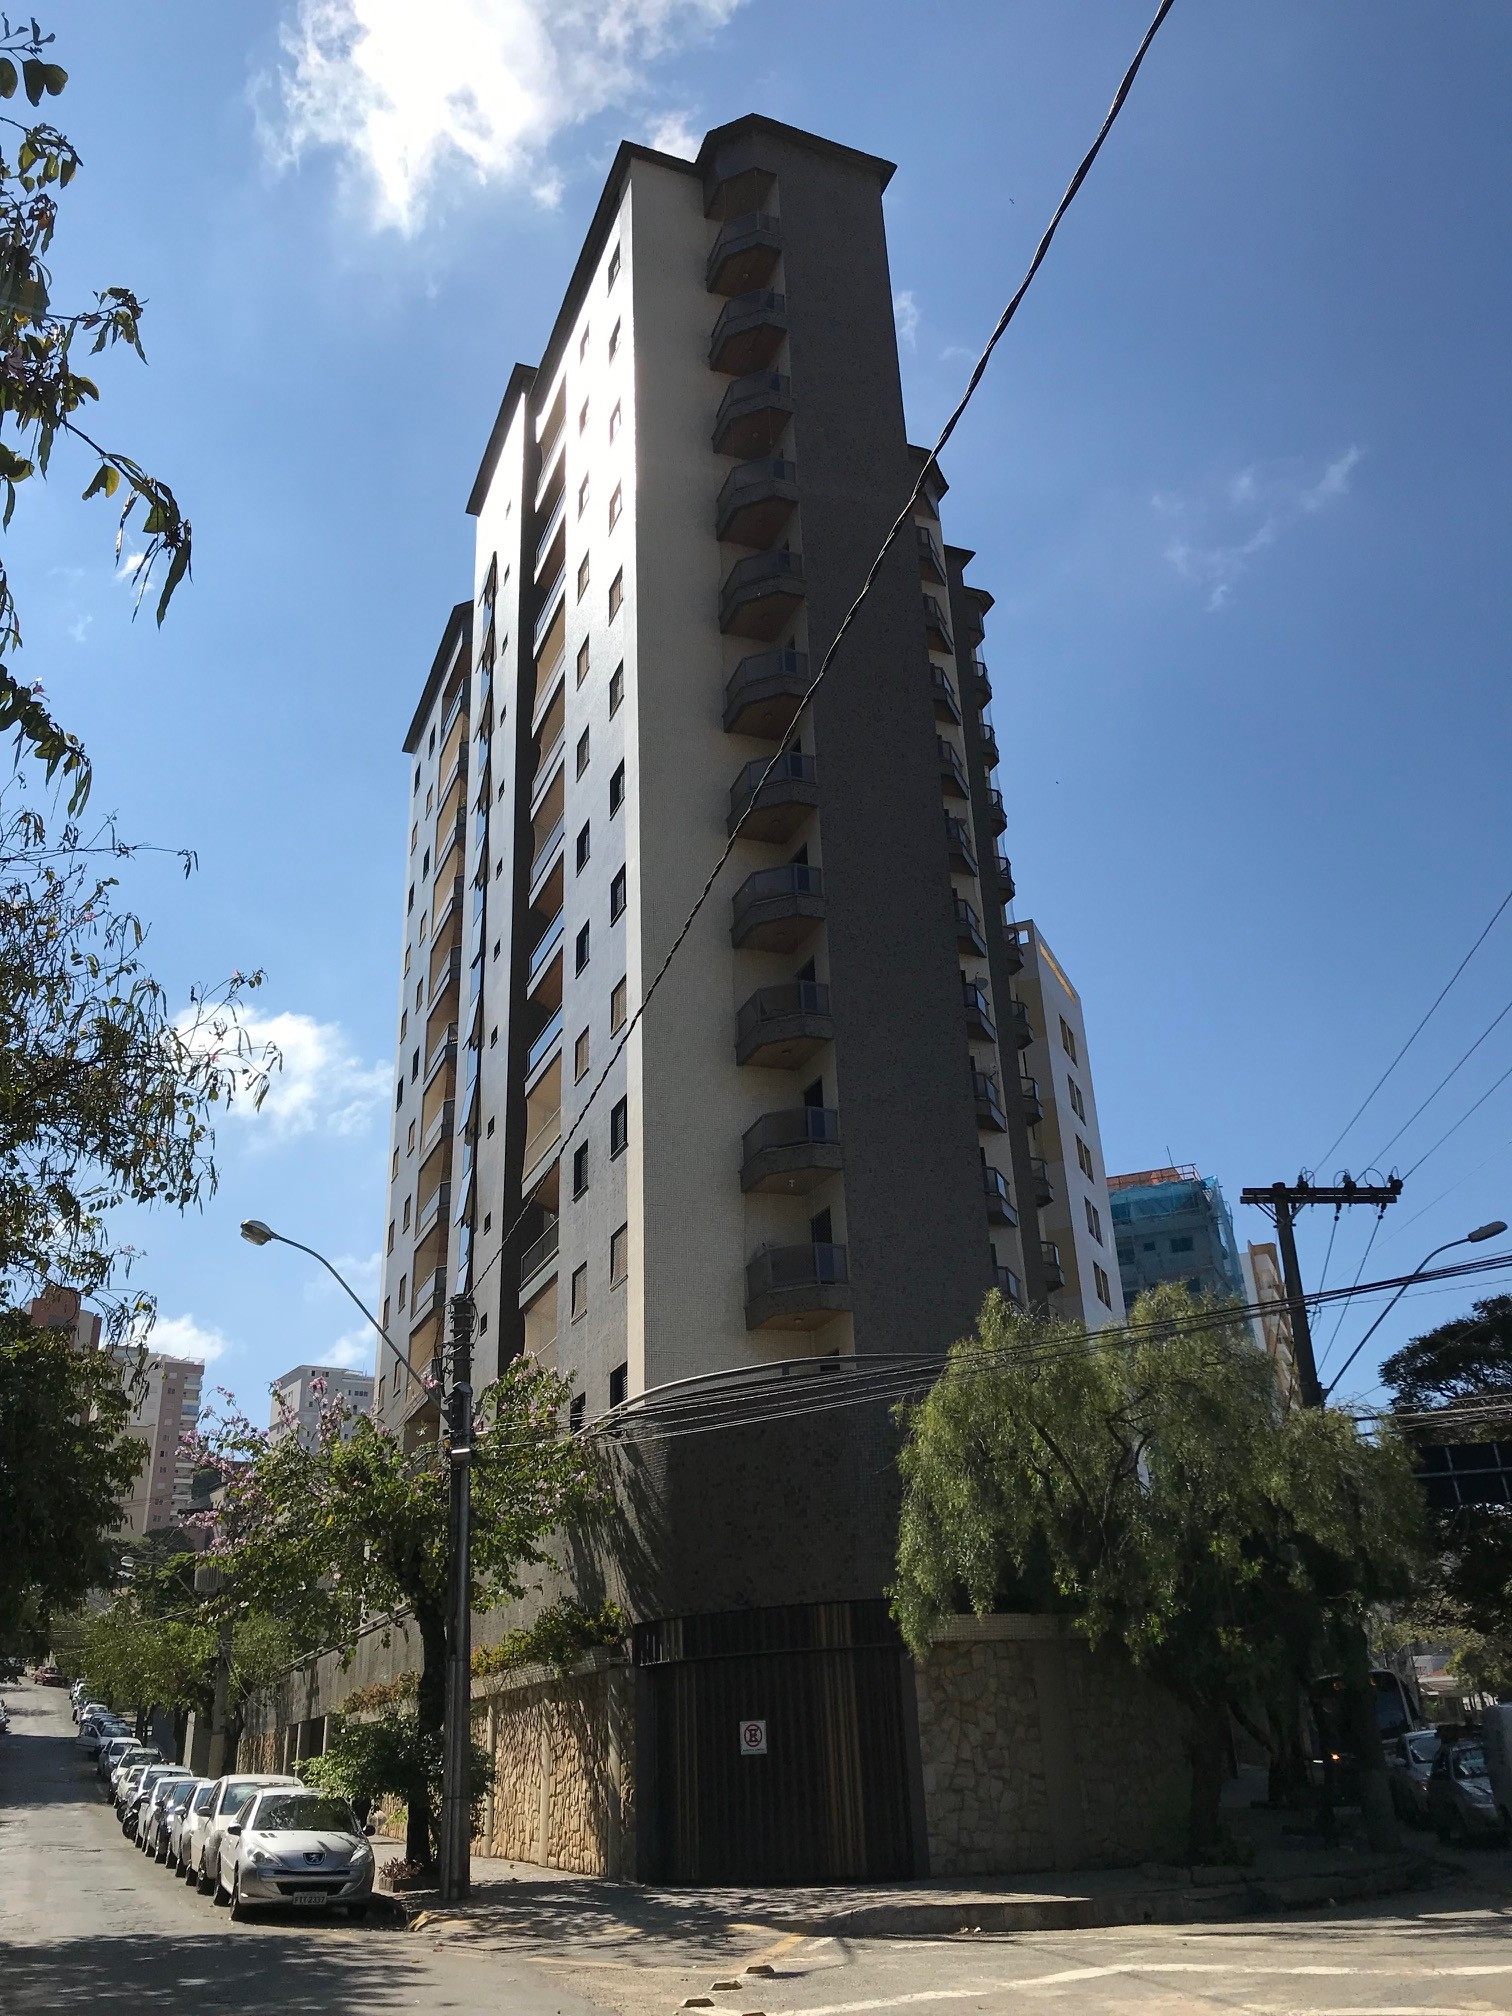 Cód 1648A - Apartamento no centro de Poços de Caldas.